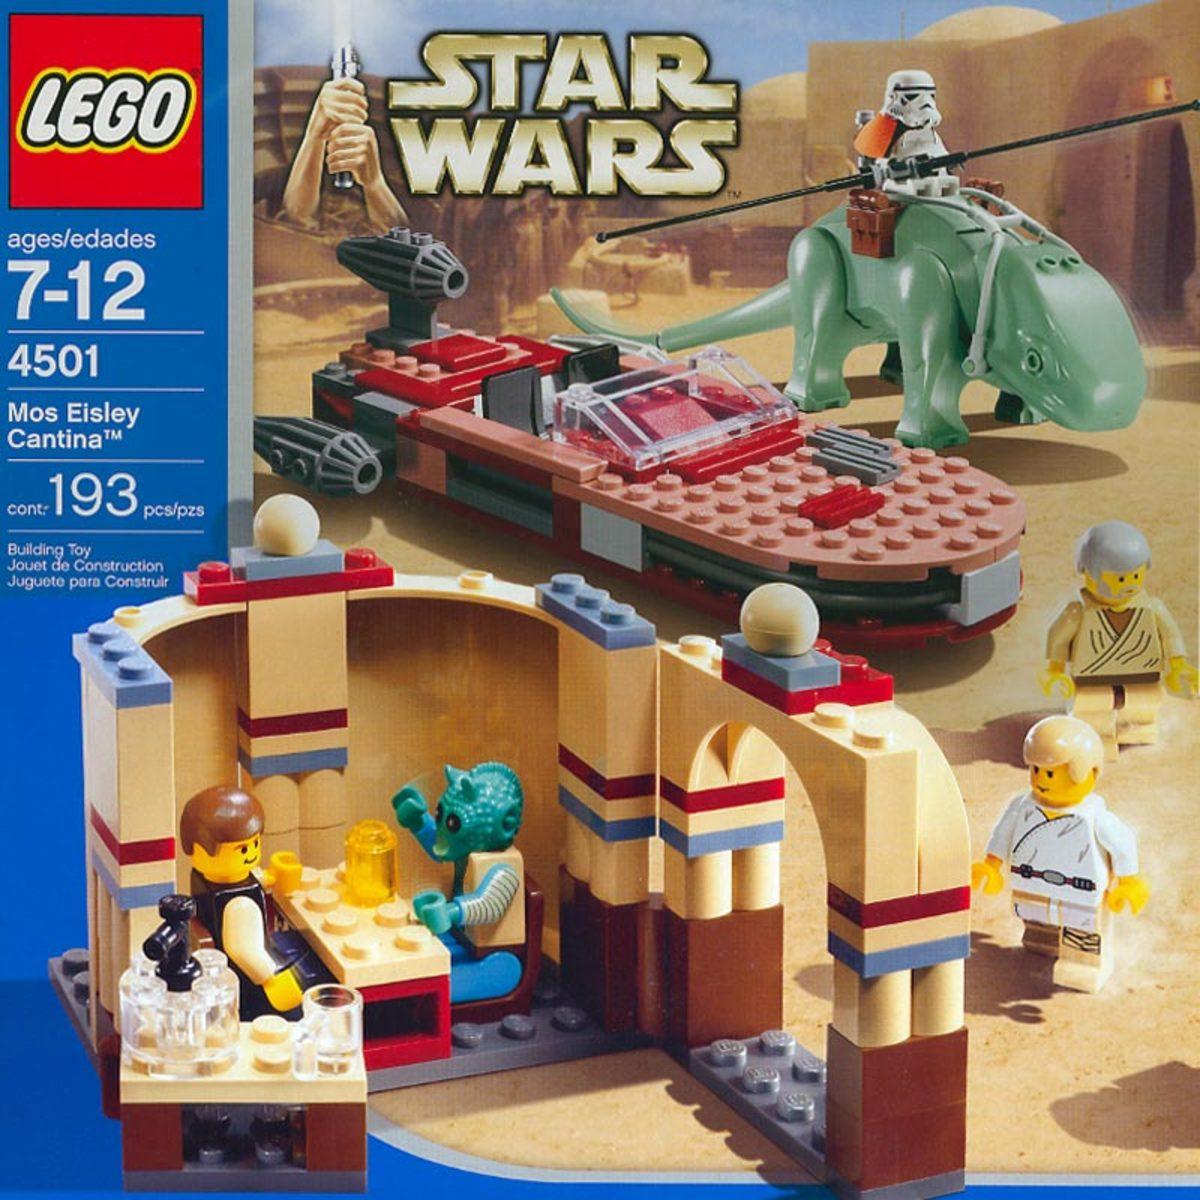 LEGO Star Wars Mos Eisley Cantina 4501 Box